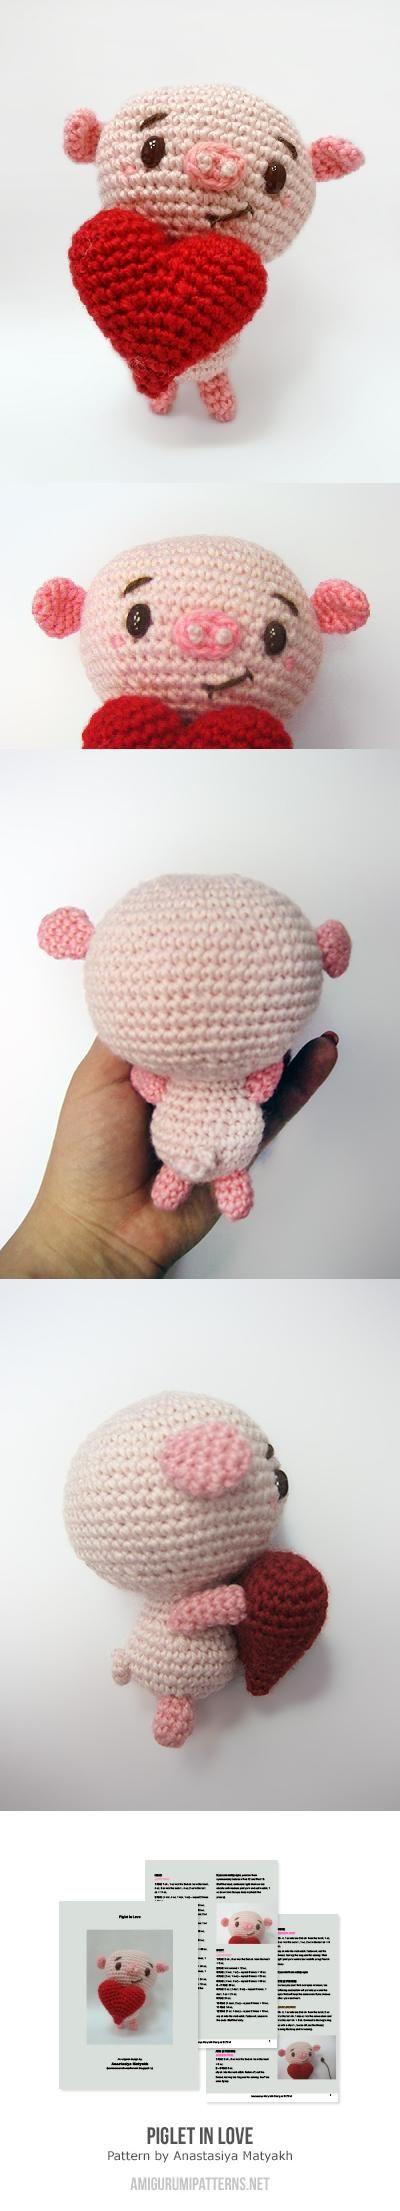 Piglet In Love Amigurumi Pattern